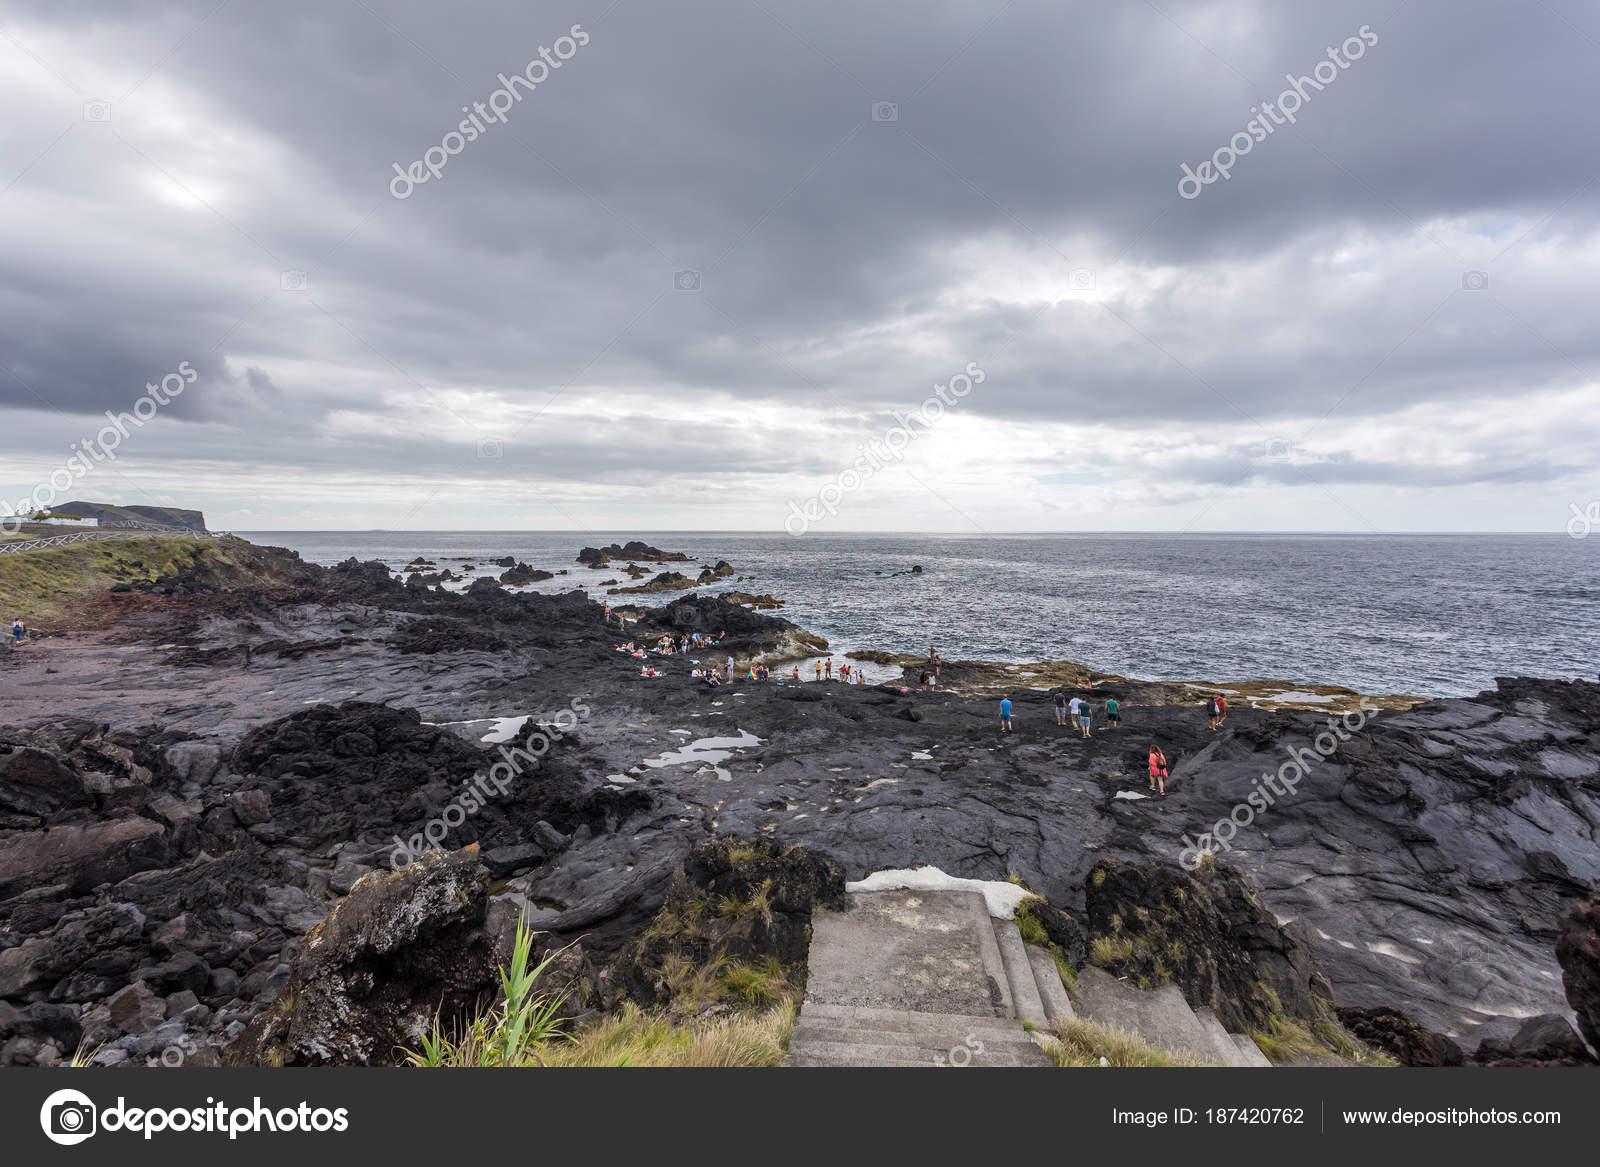 Mosteiros Beach Sao Miguel Island Azores Stock Photo